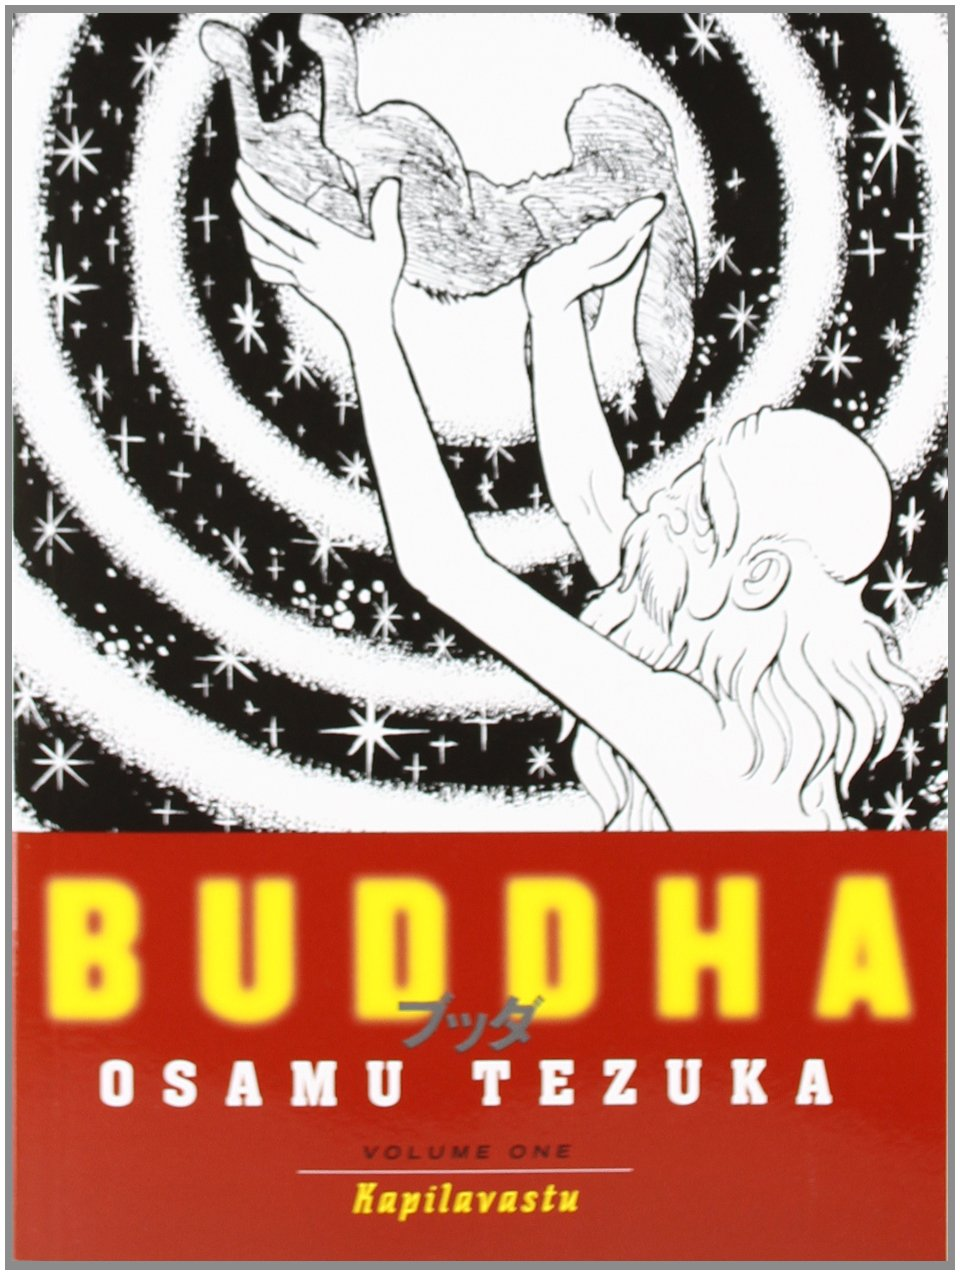 Image result for buddha osamu tezuka vol. 1